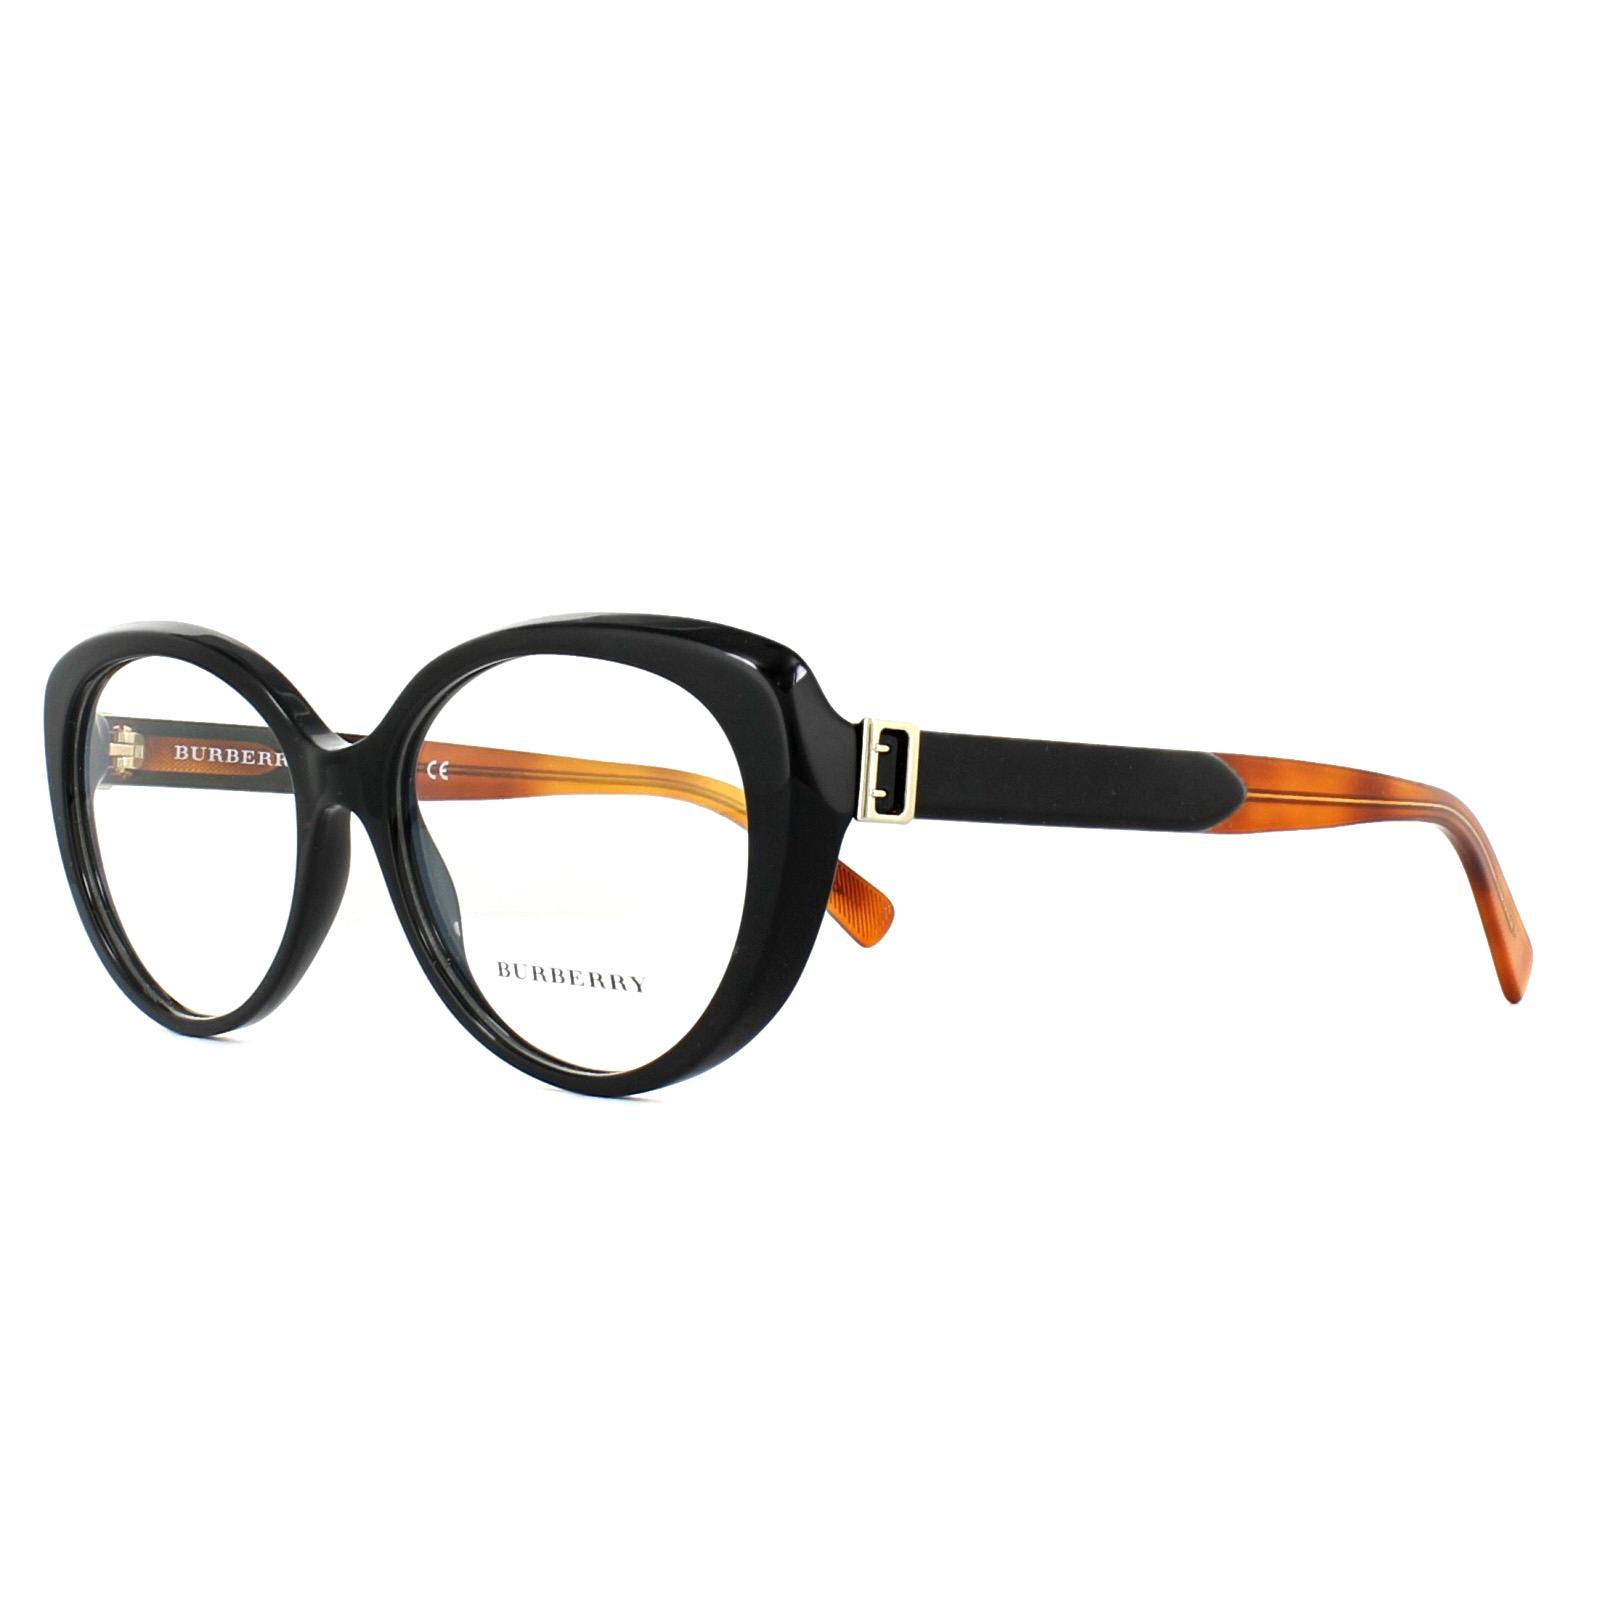 9224a564183 Burberry Glasses Frames BE2251 3637 Black 53mm Womens 8053672711677 ...